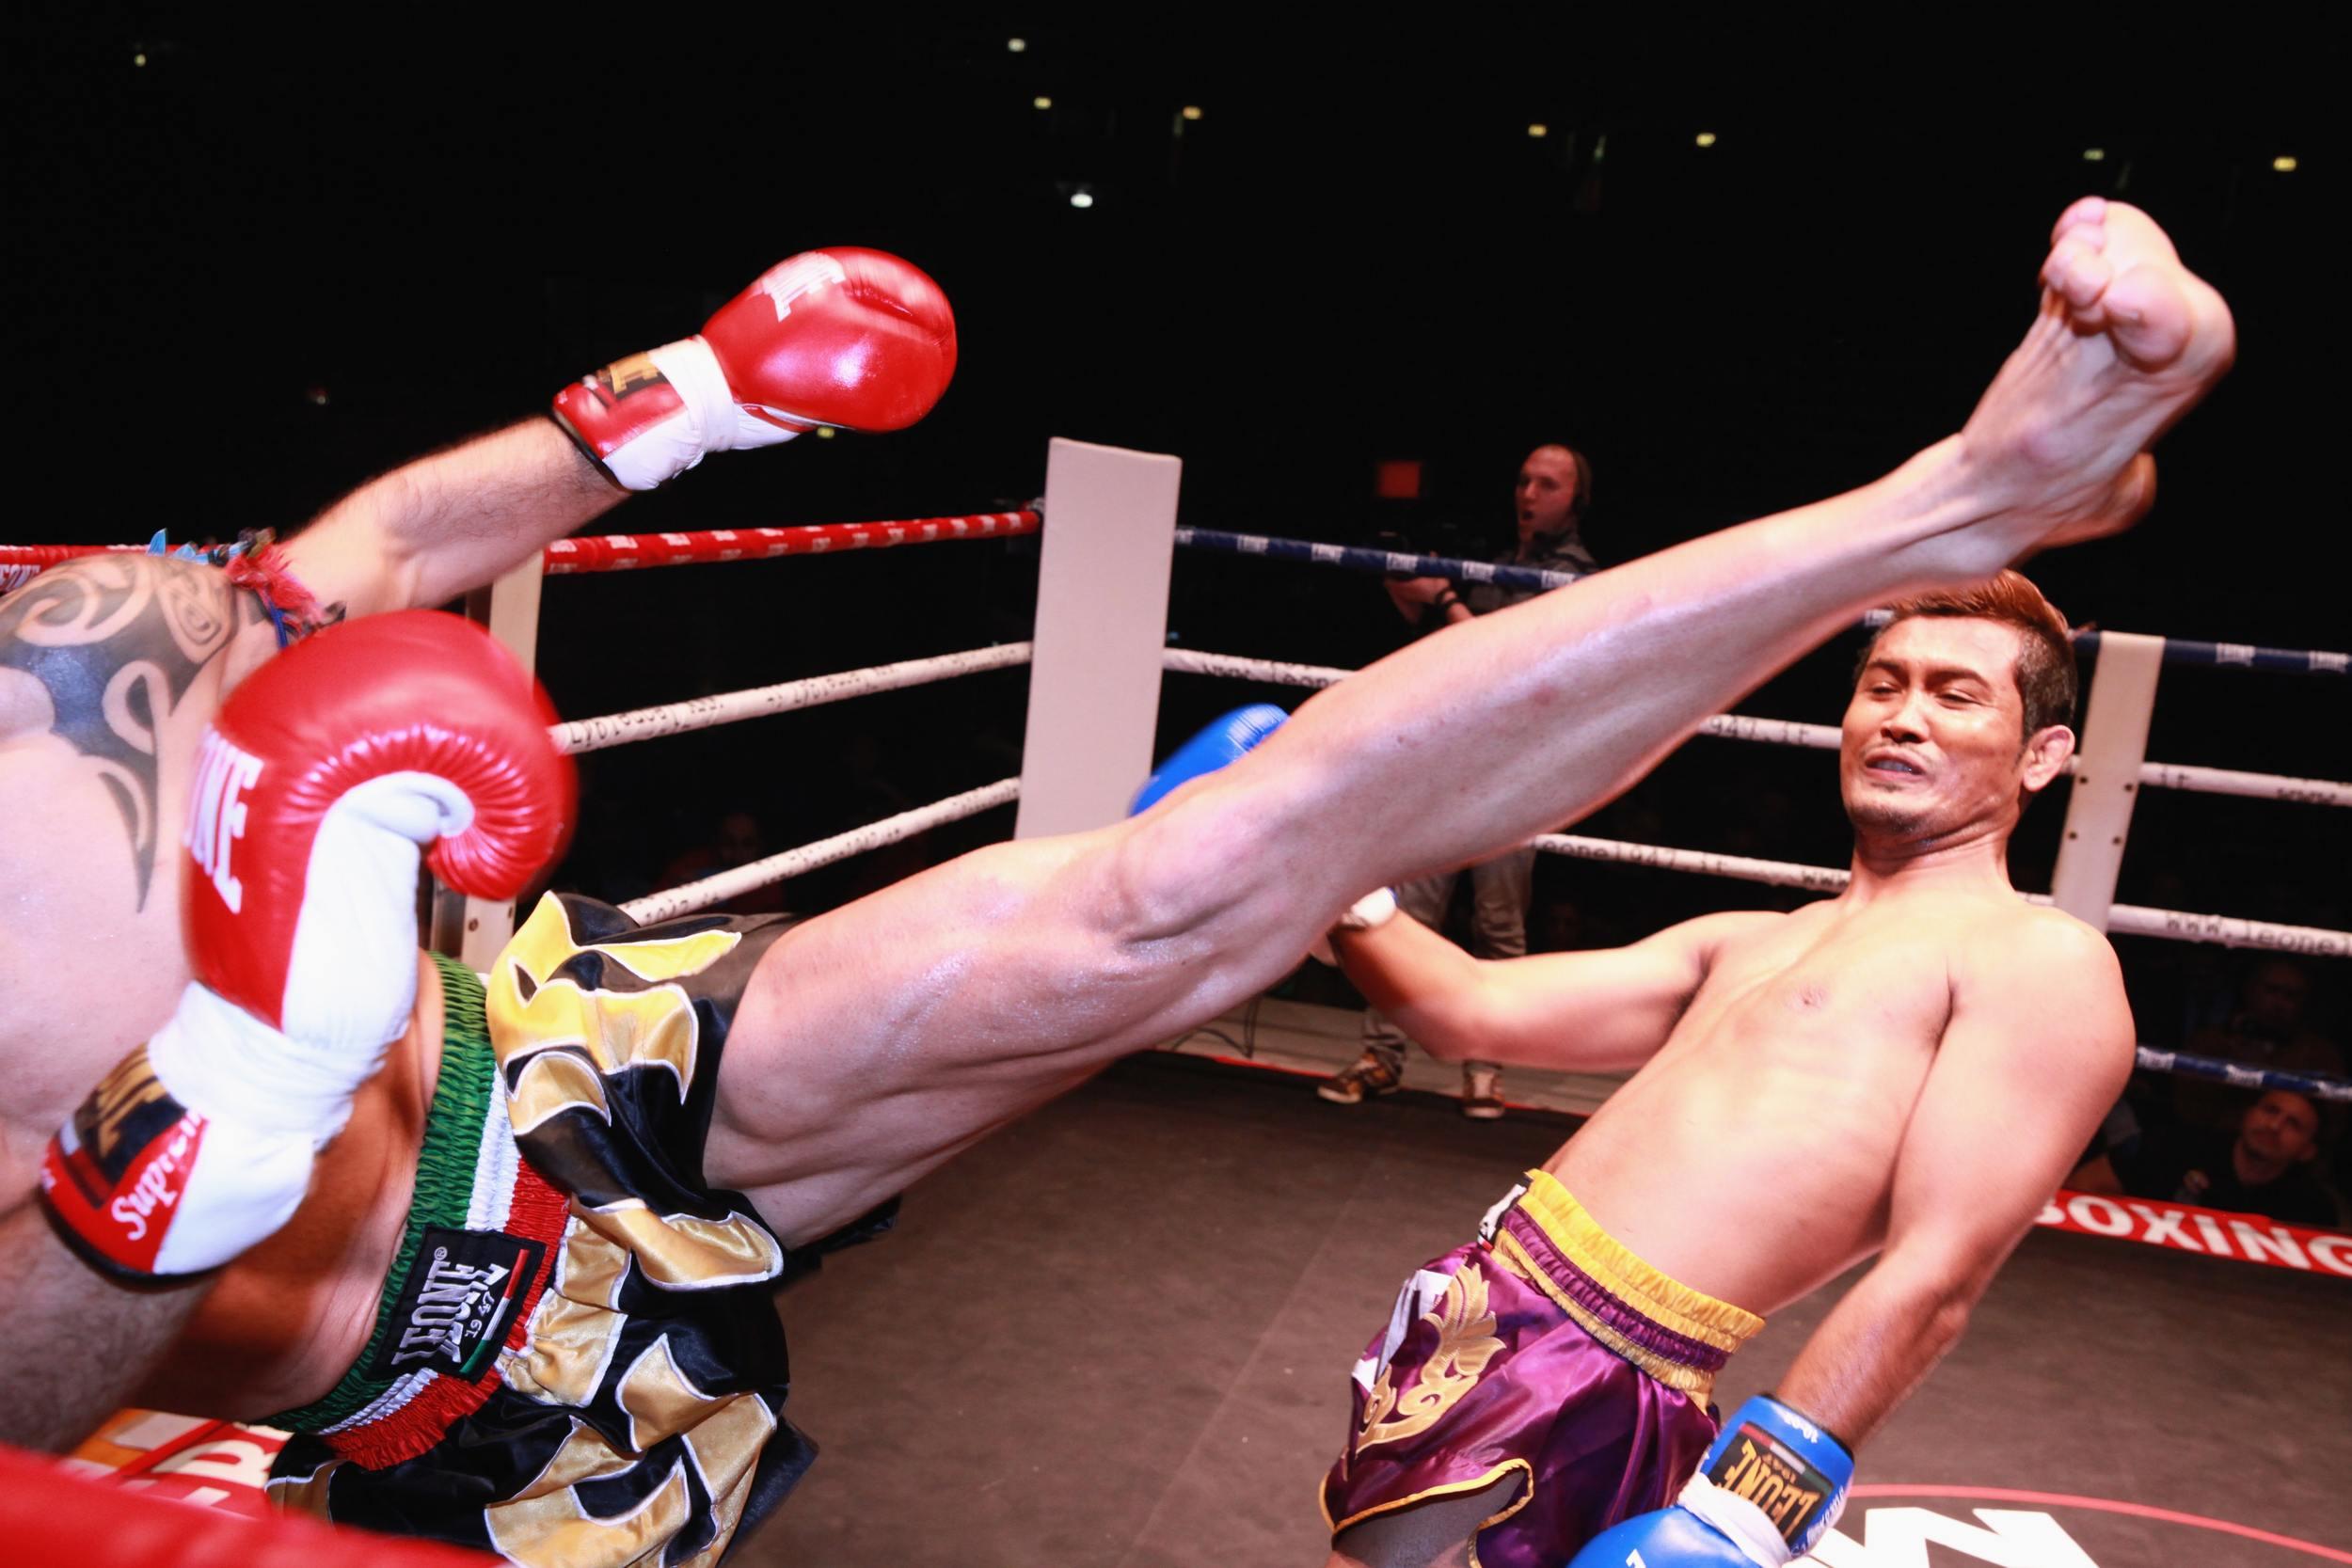 Muay Thai Kickboxing - Koh Tao, Thailand